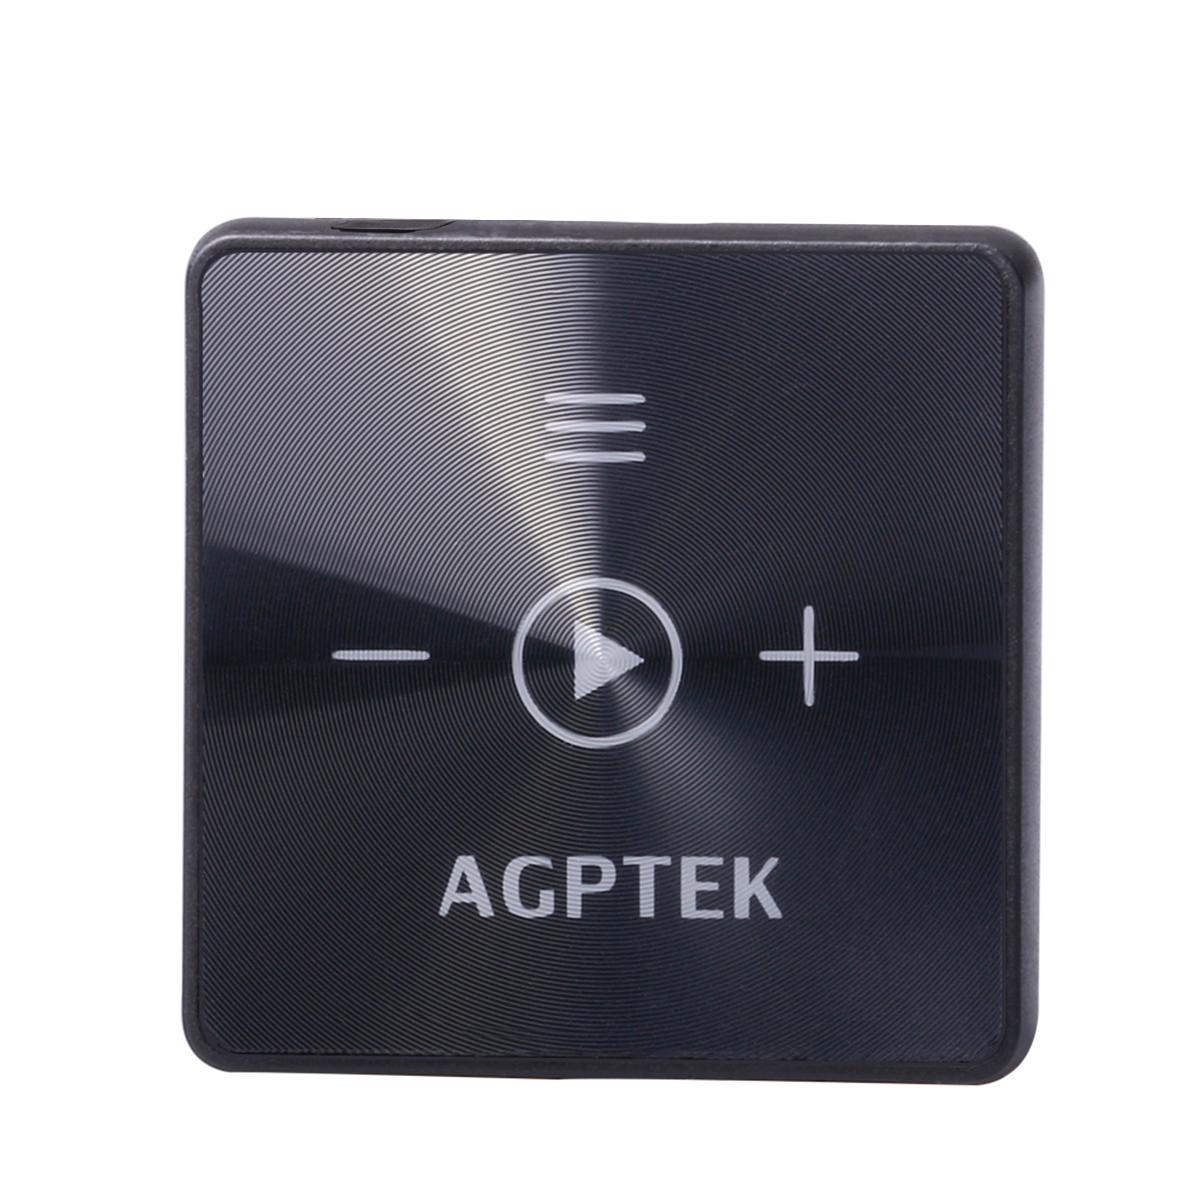 AGPtEK A15 8GB Bluetooth 4.2 MP3 Player,Sports Clip,HIFI Music Player,Black